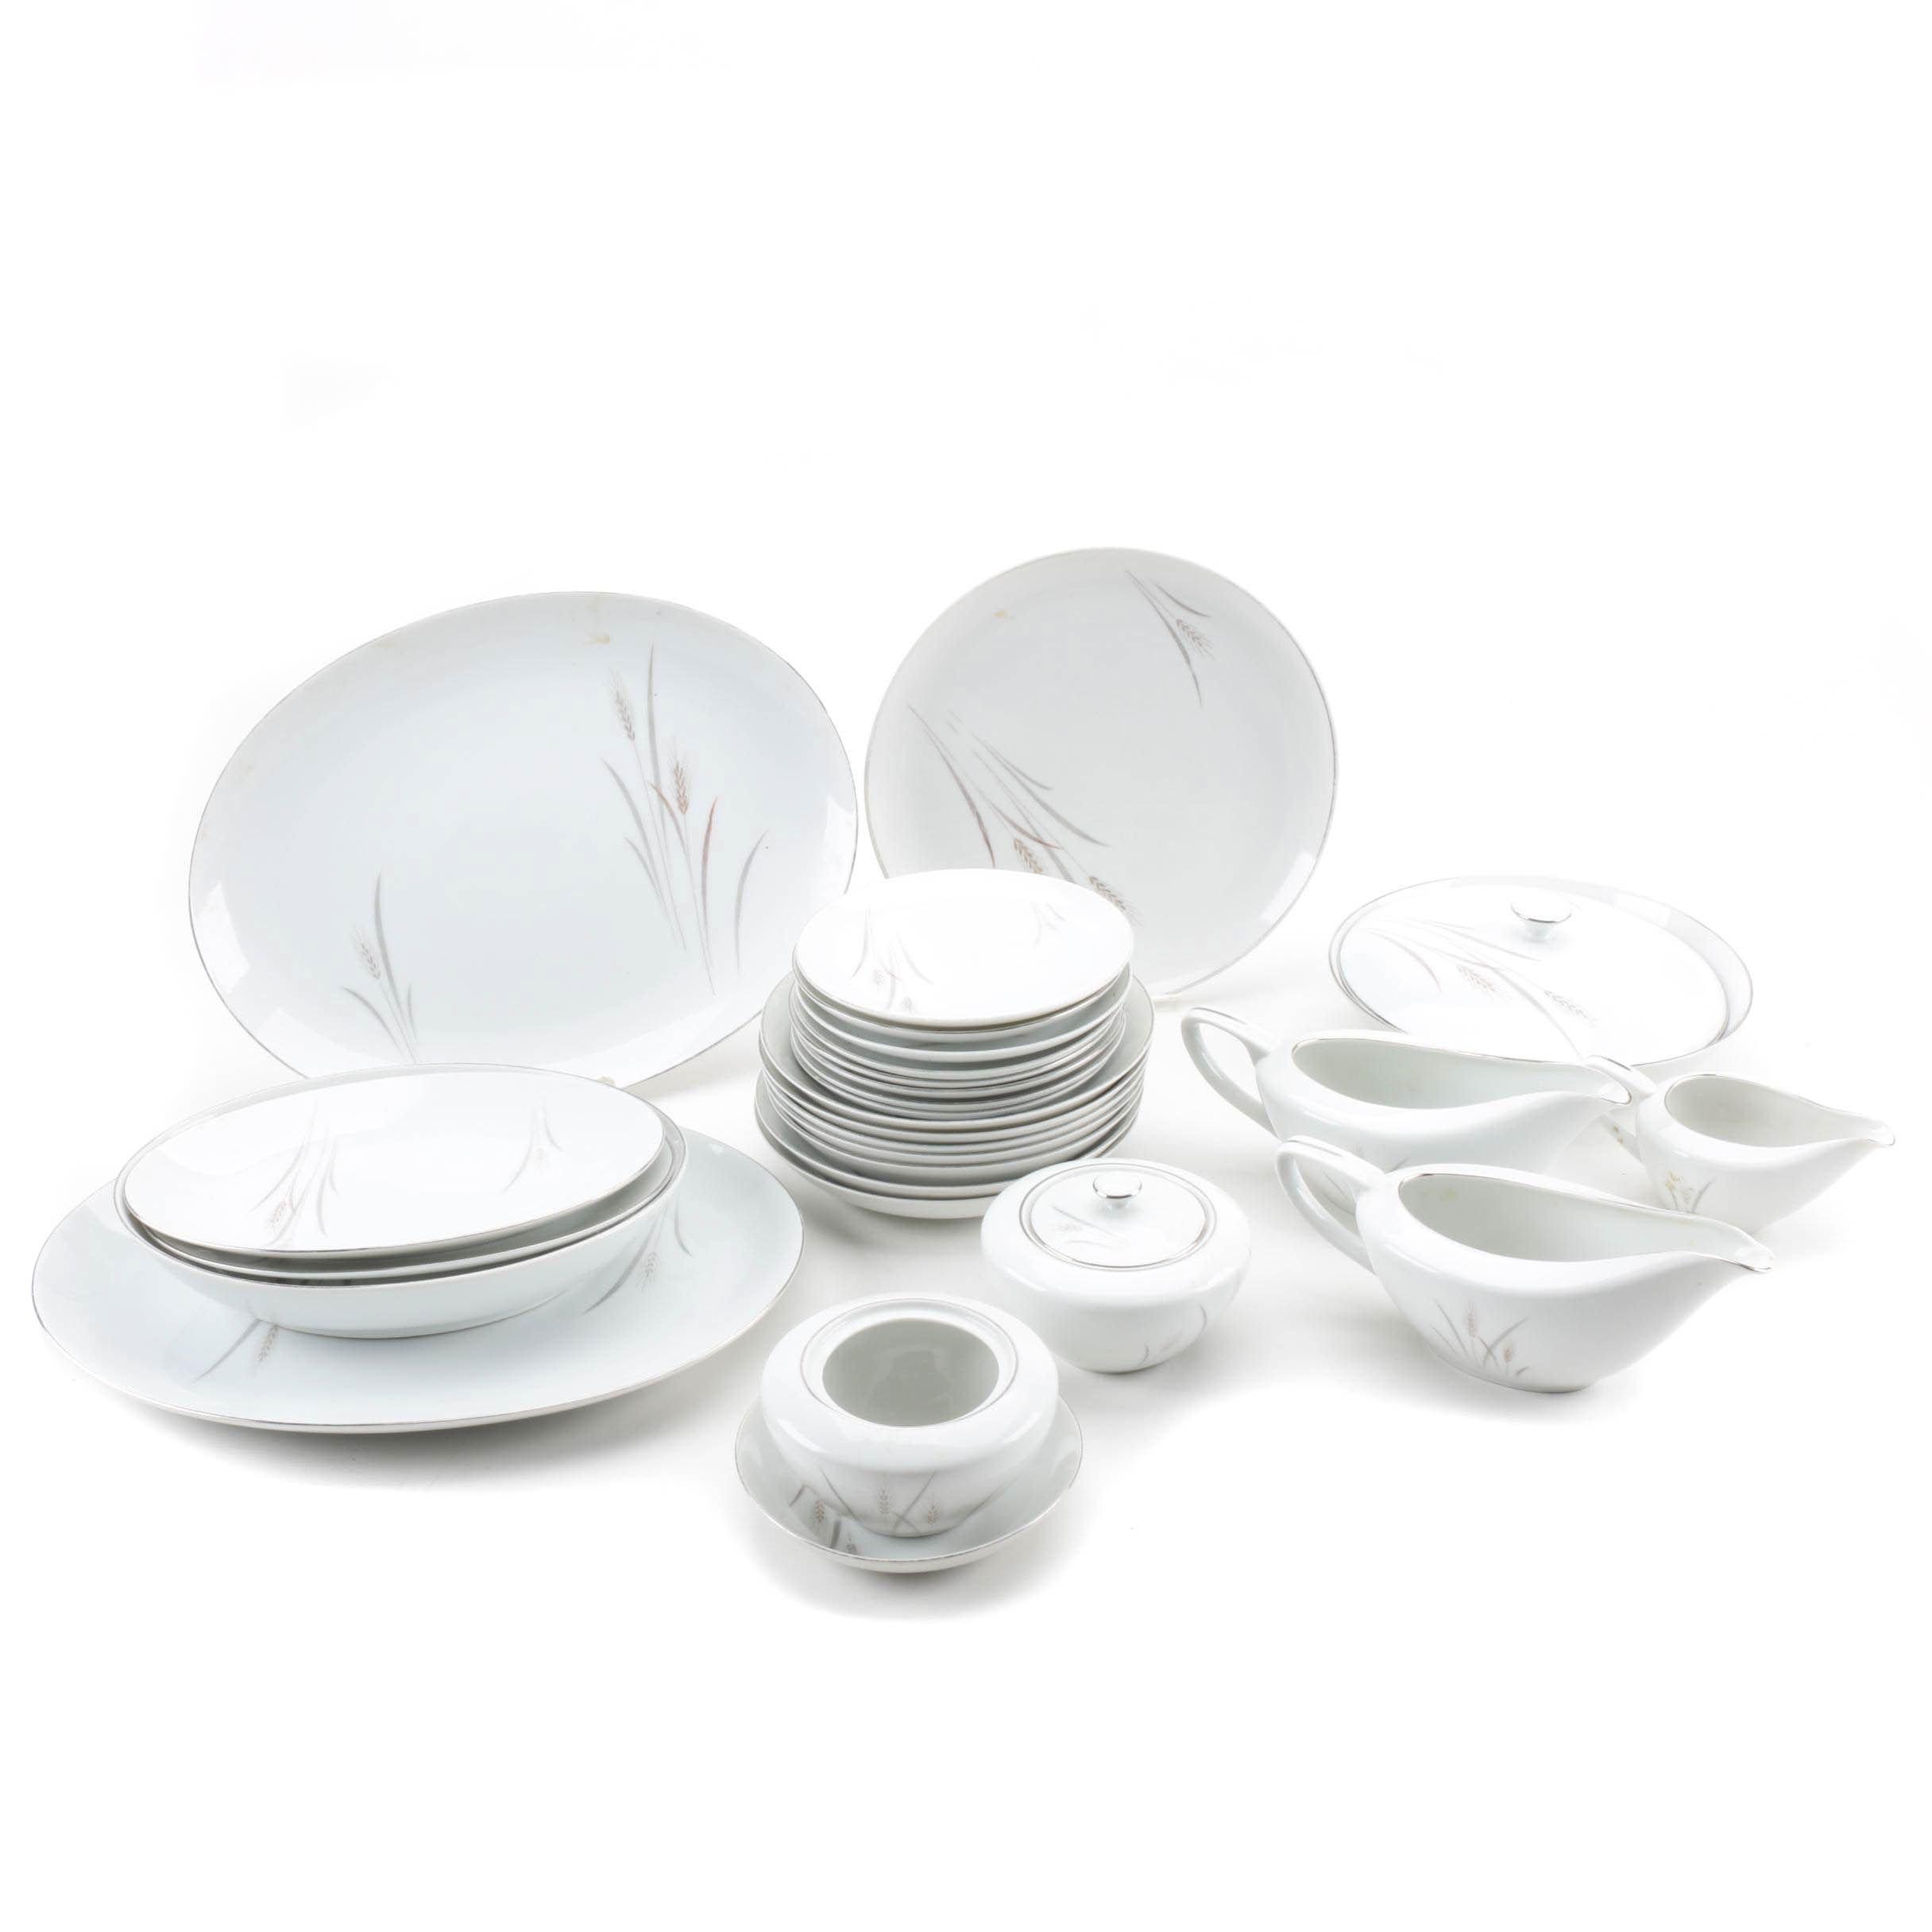 "Fine China of Japan ""Platinum Wheat"" Dishware Set"